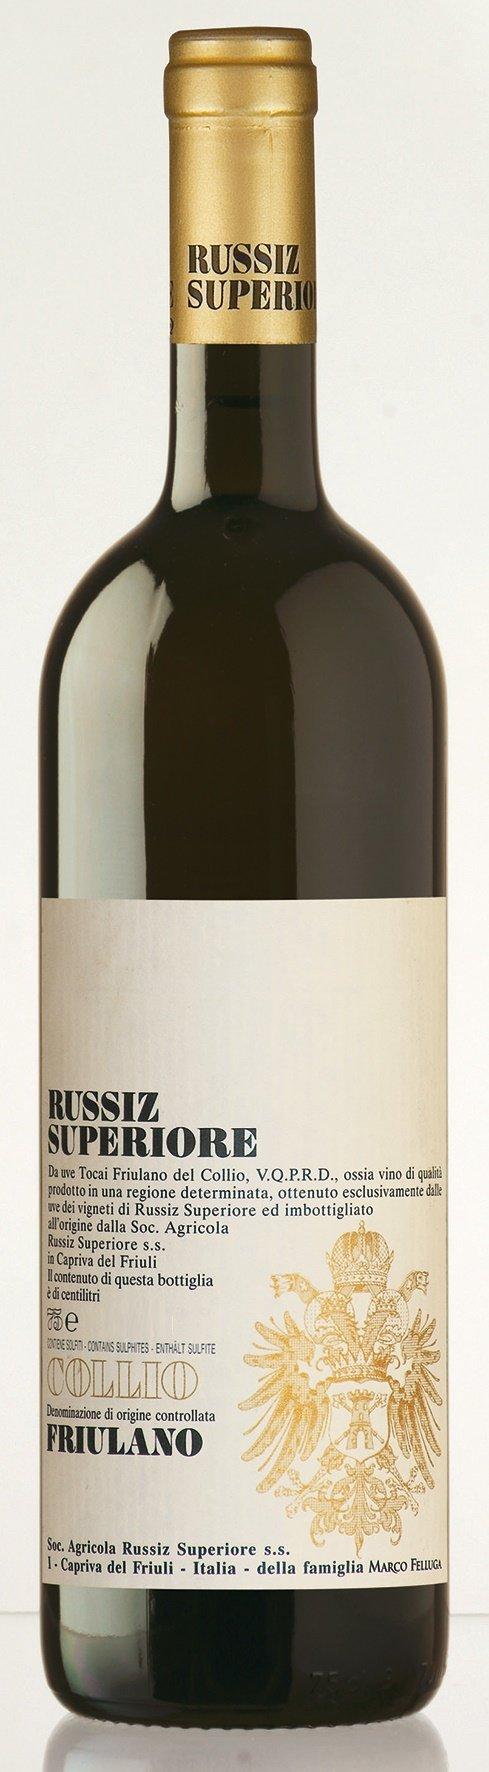 6-x-075l-2017er-Russiz-Superiore-Friulano-Collio-DOC-Friaul-Italien-Weiwein-trocken